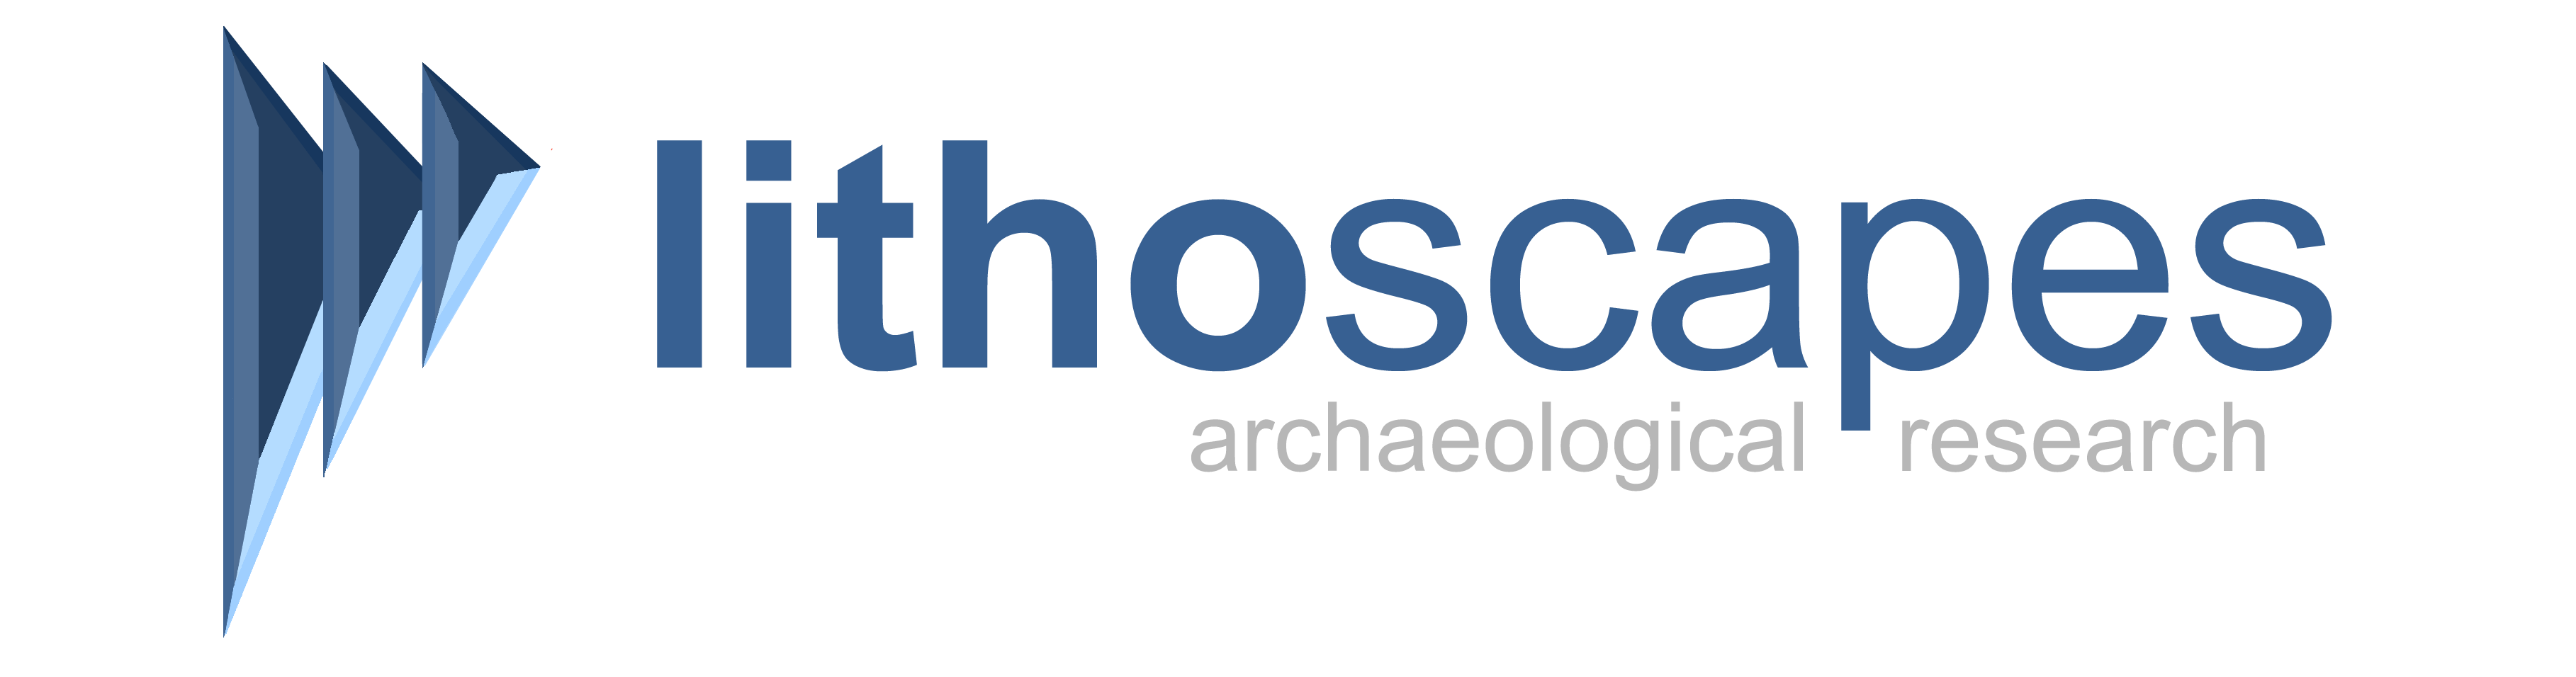 Lithoscapes